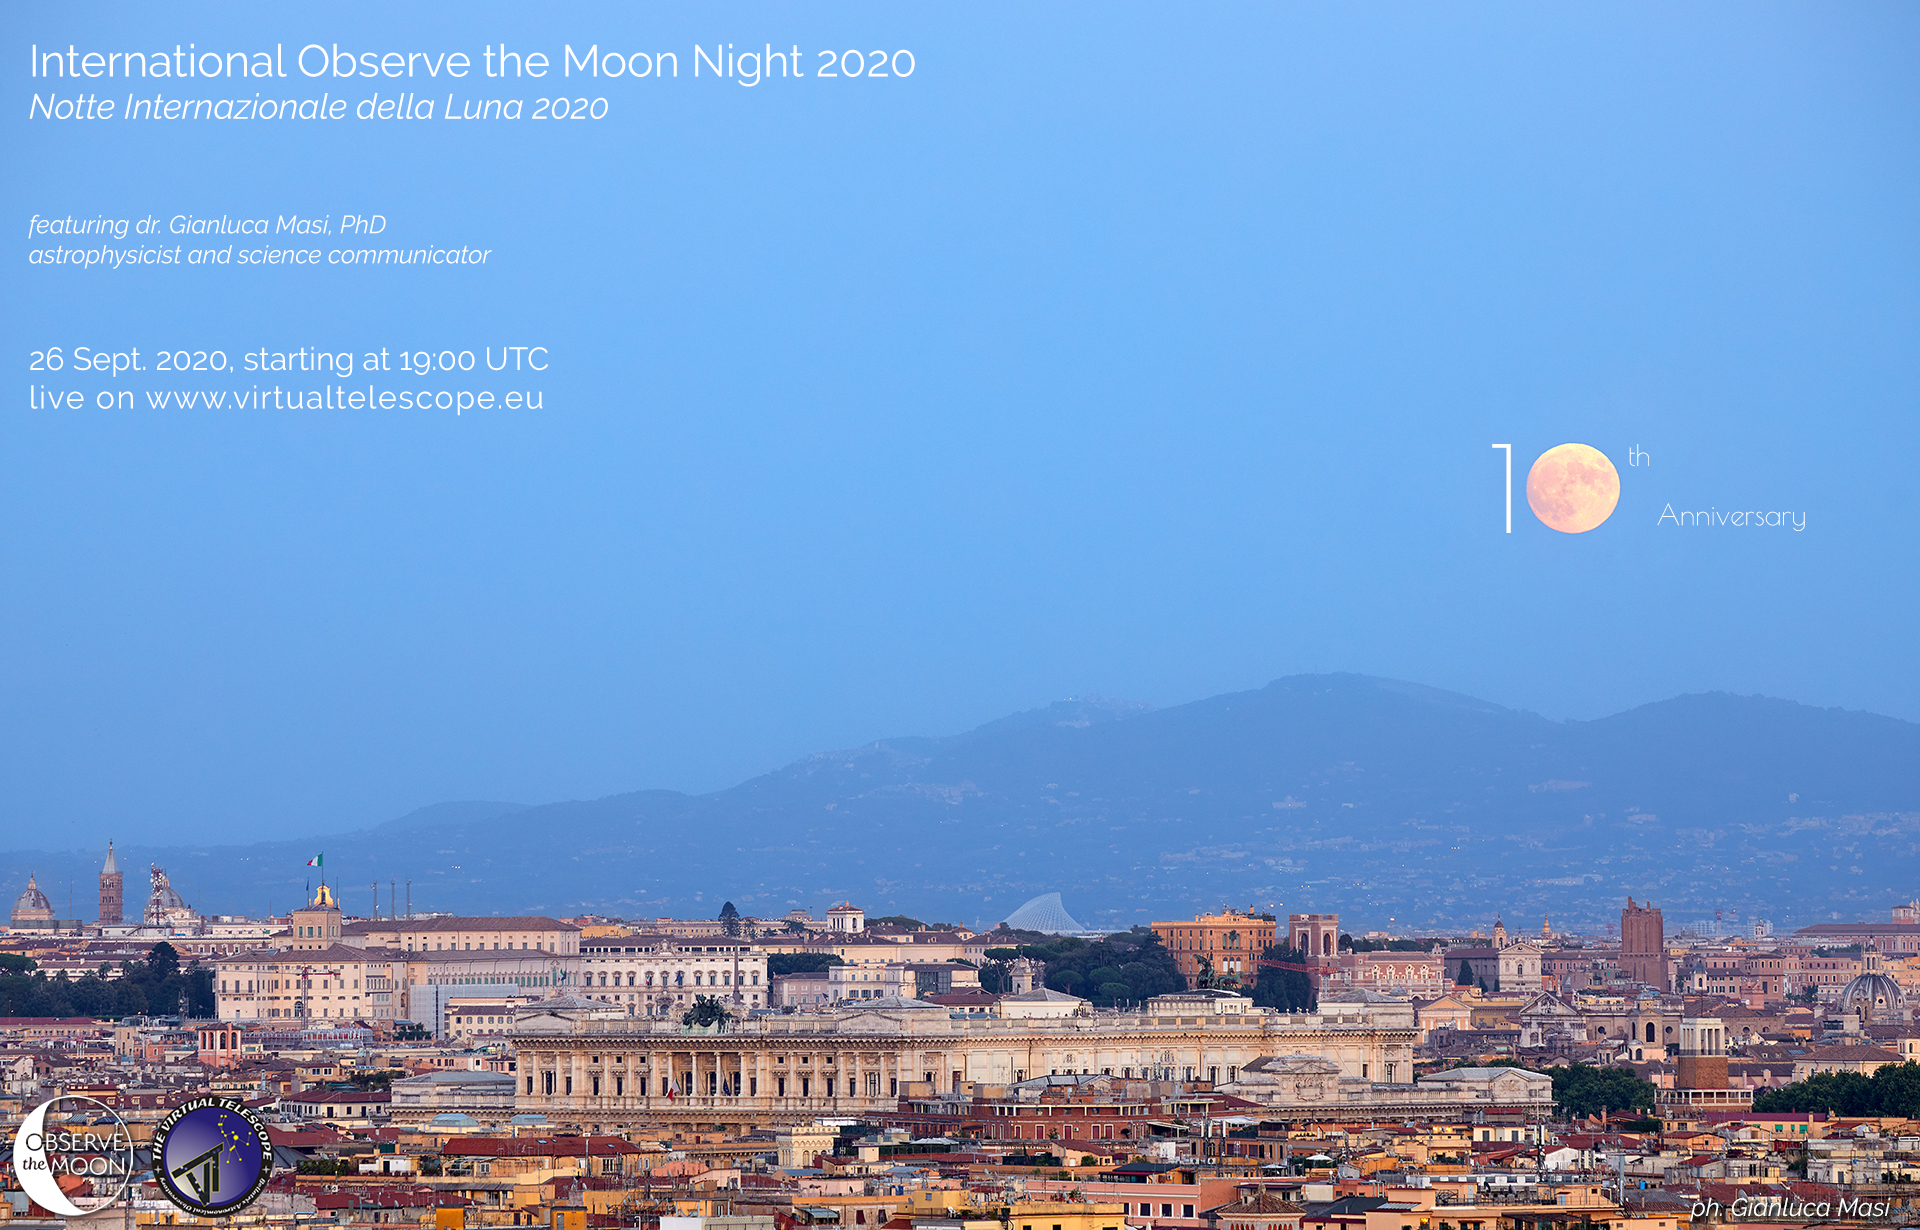 International Observe the Moon Night 2020: online observation - 26 Sept. 2020